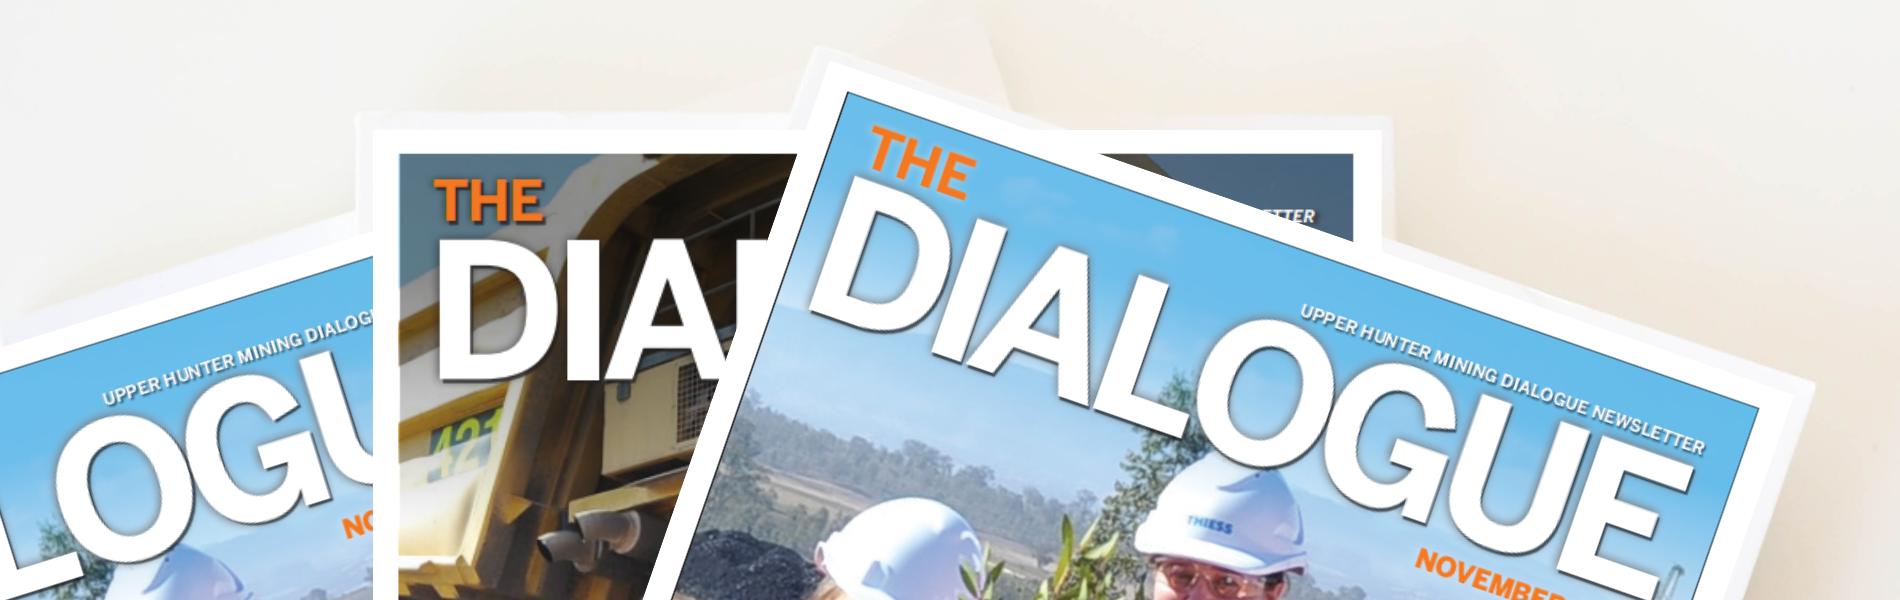 Upper Hunter Mining Dialogue November 2018 Newsletter